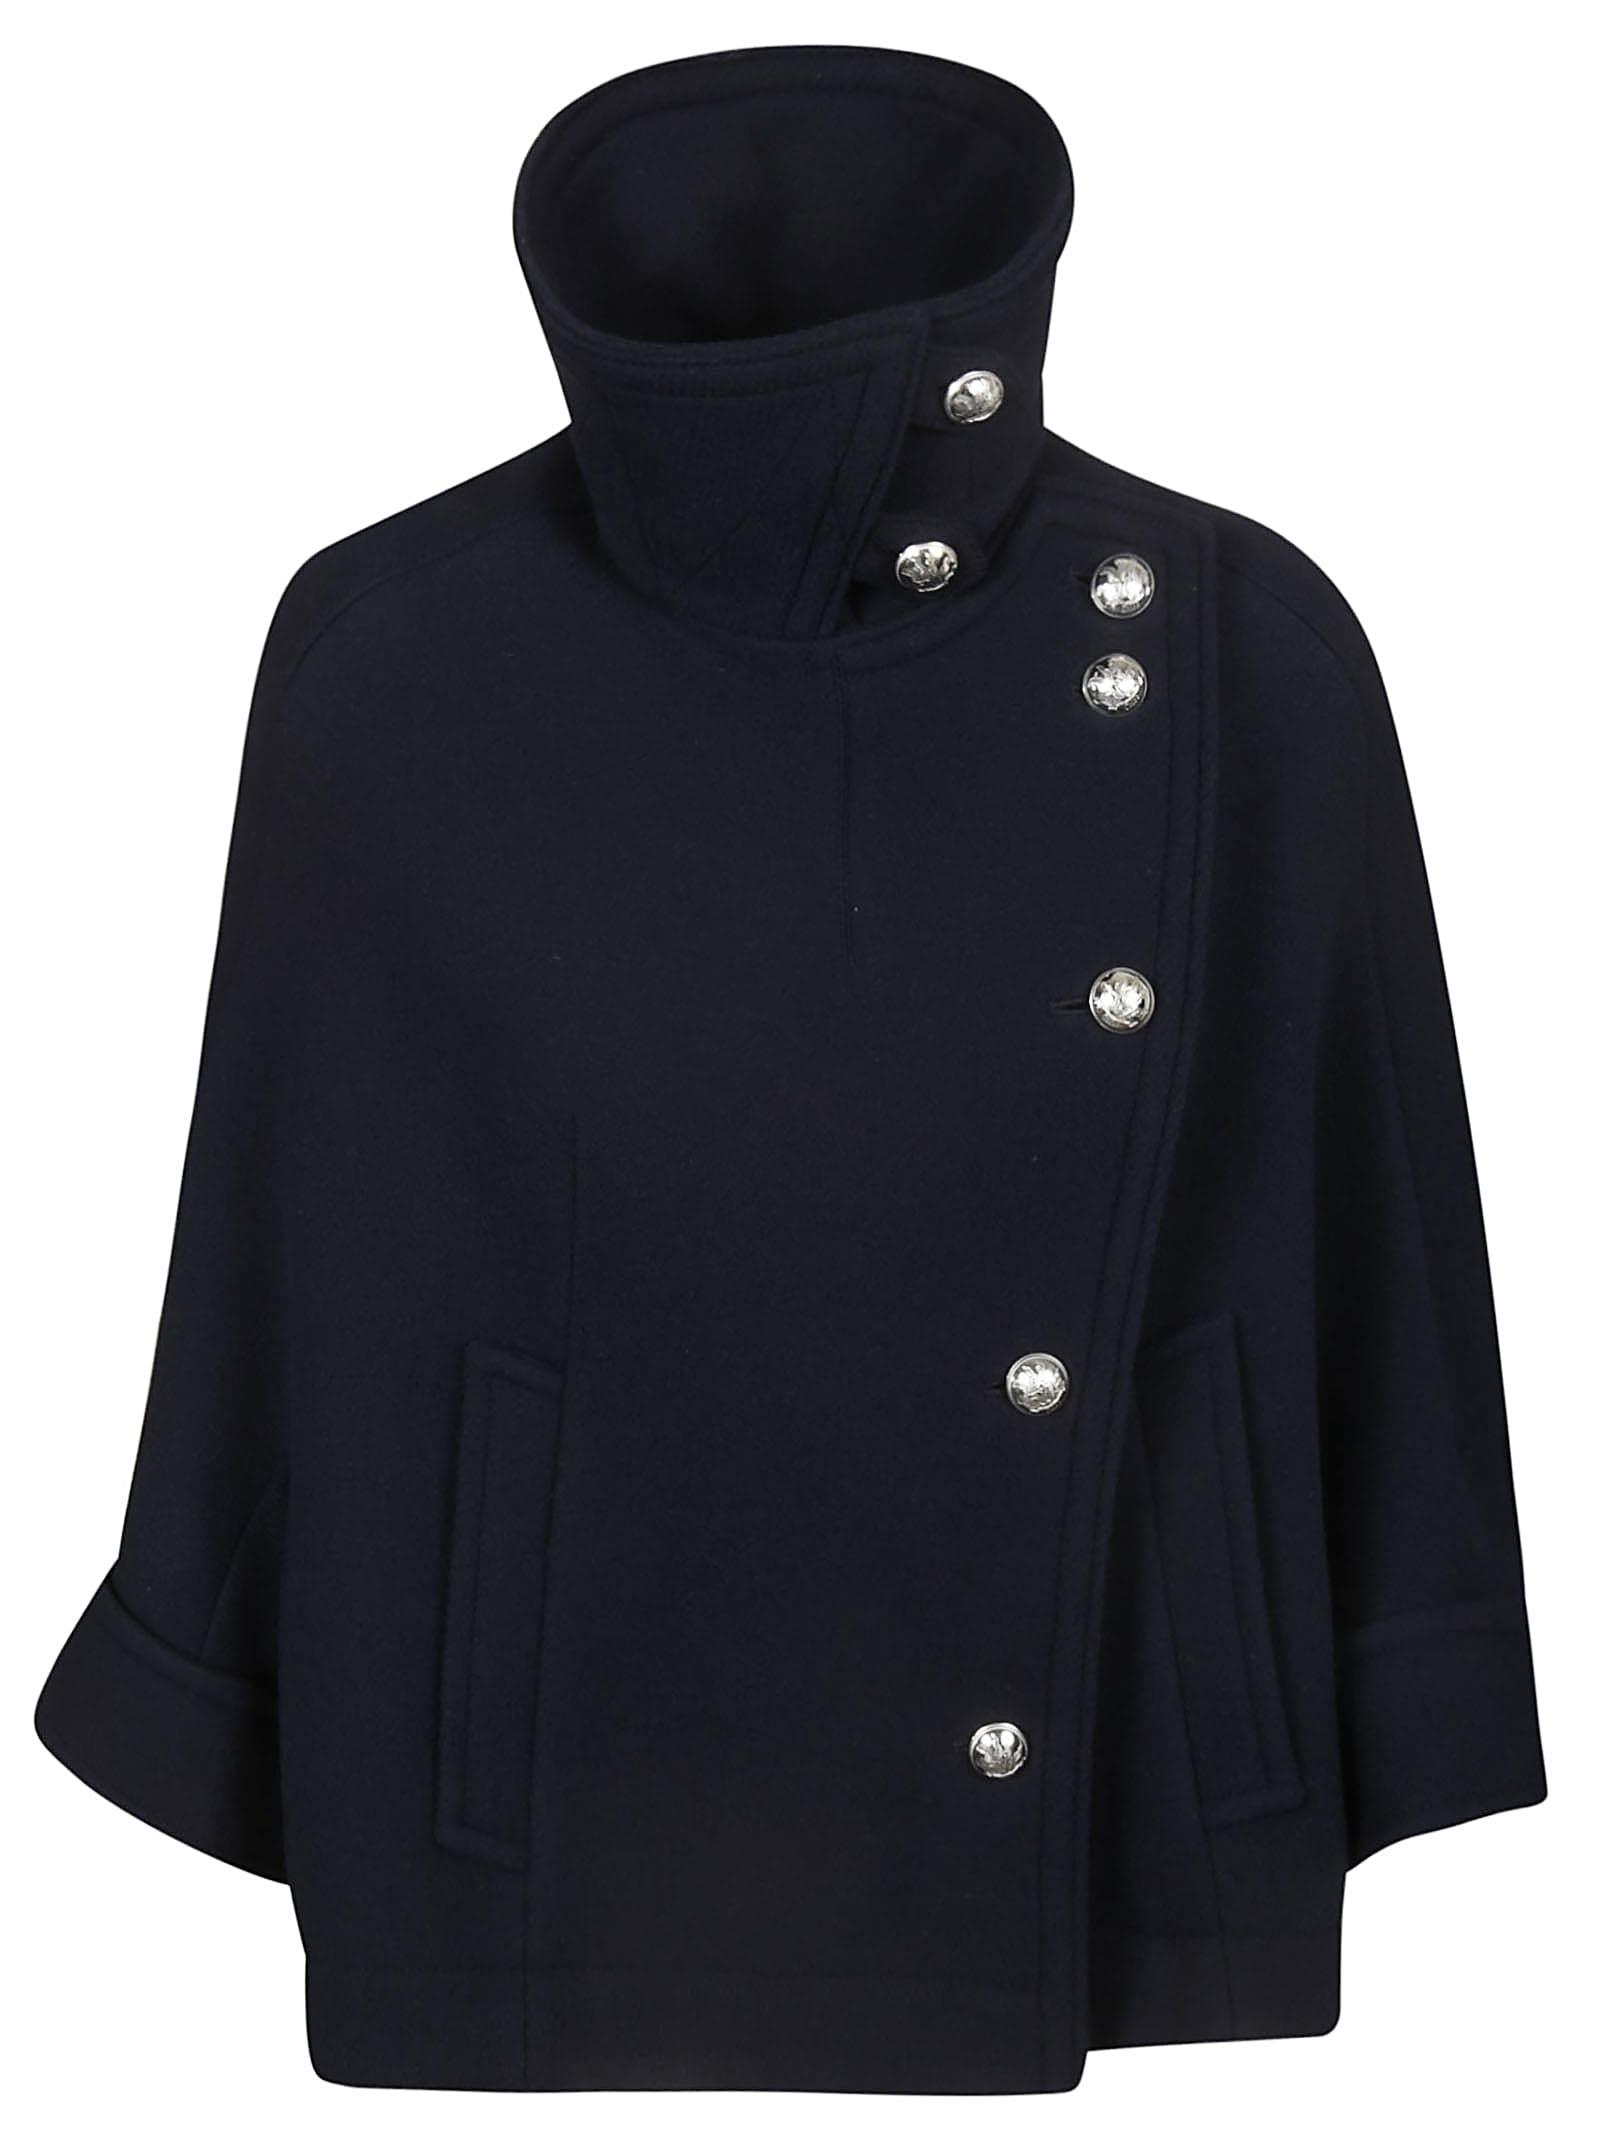 Chloé One Sided High Neck Jacket